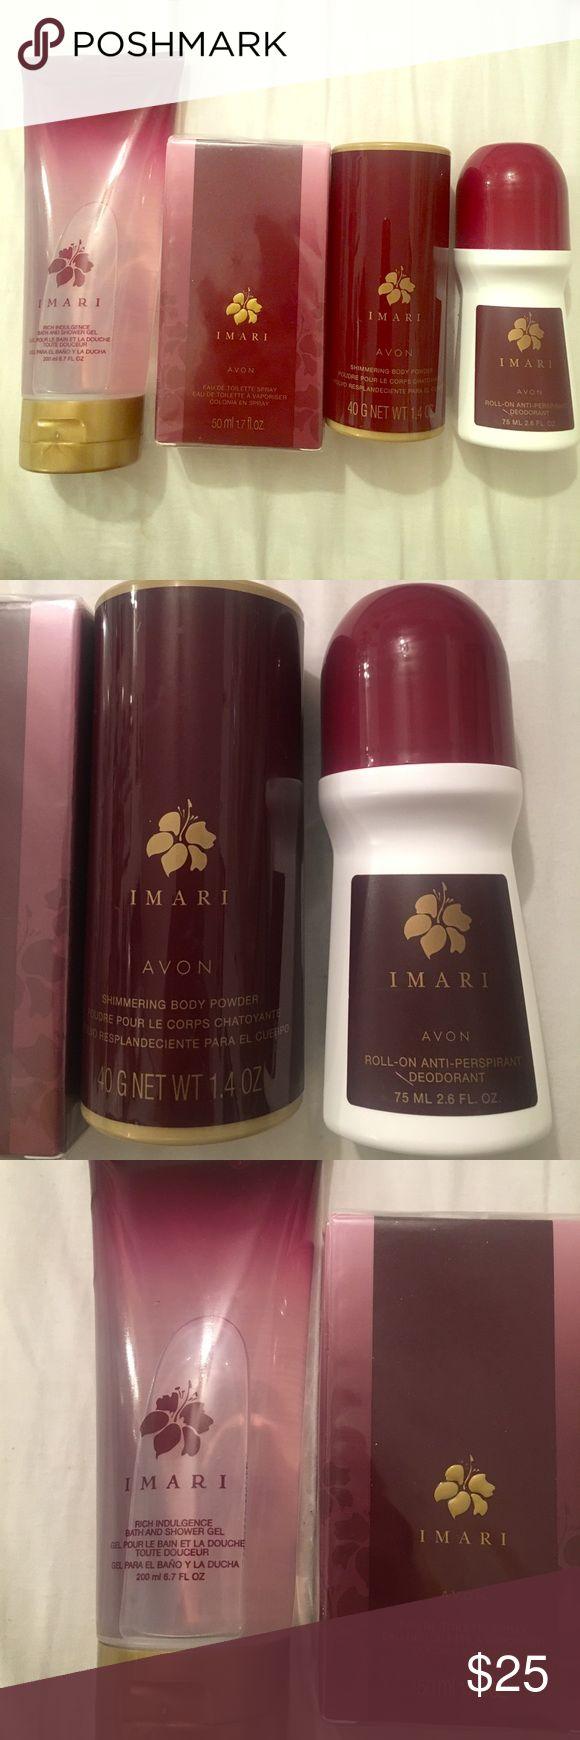 Imari Avon collection Perfume, shower gel, body powder, & deodorant! New! Other